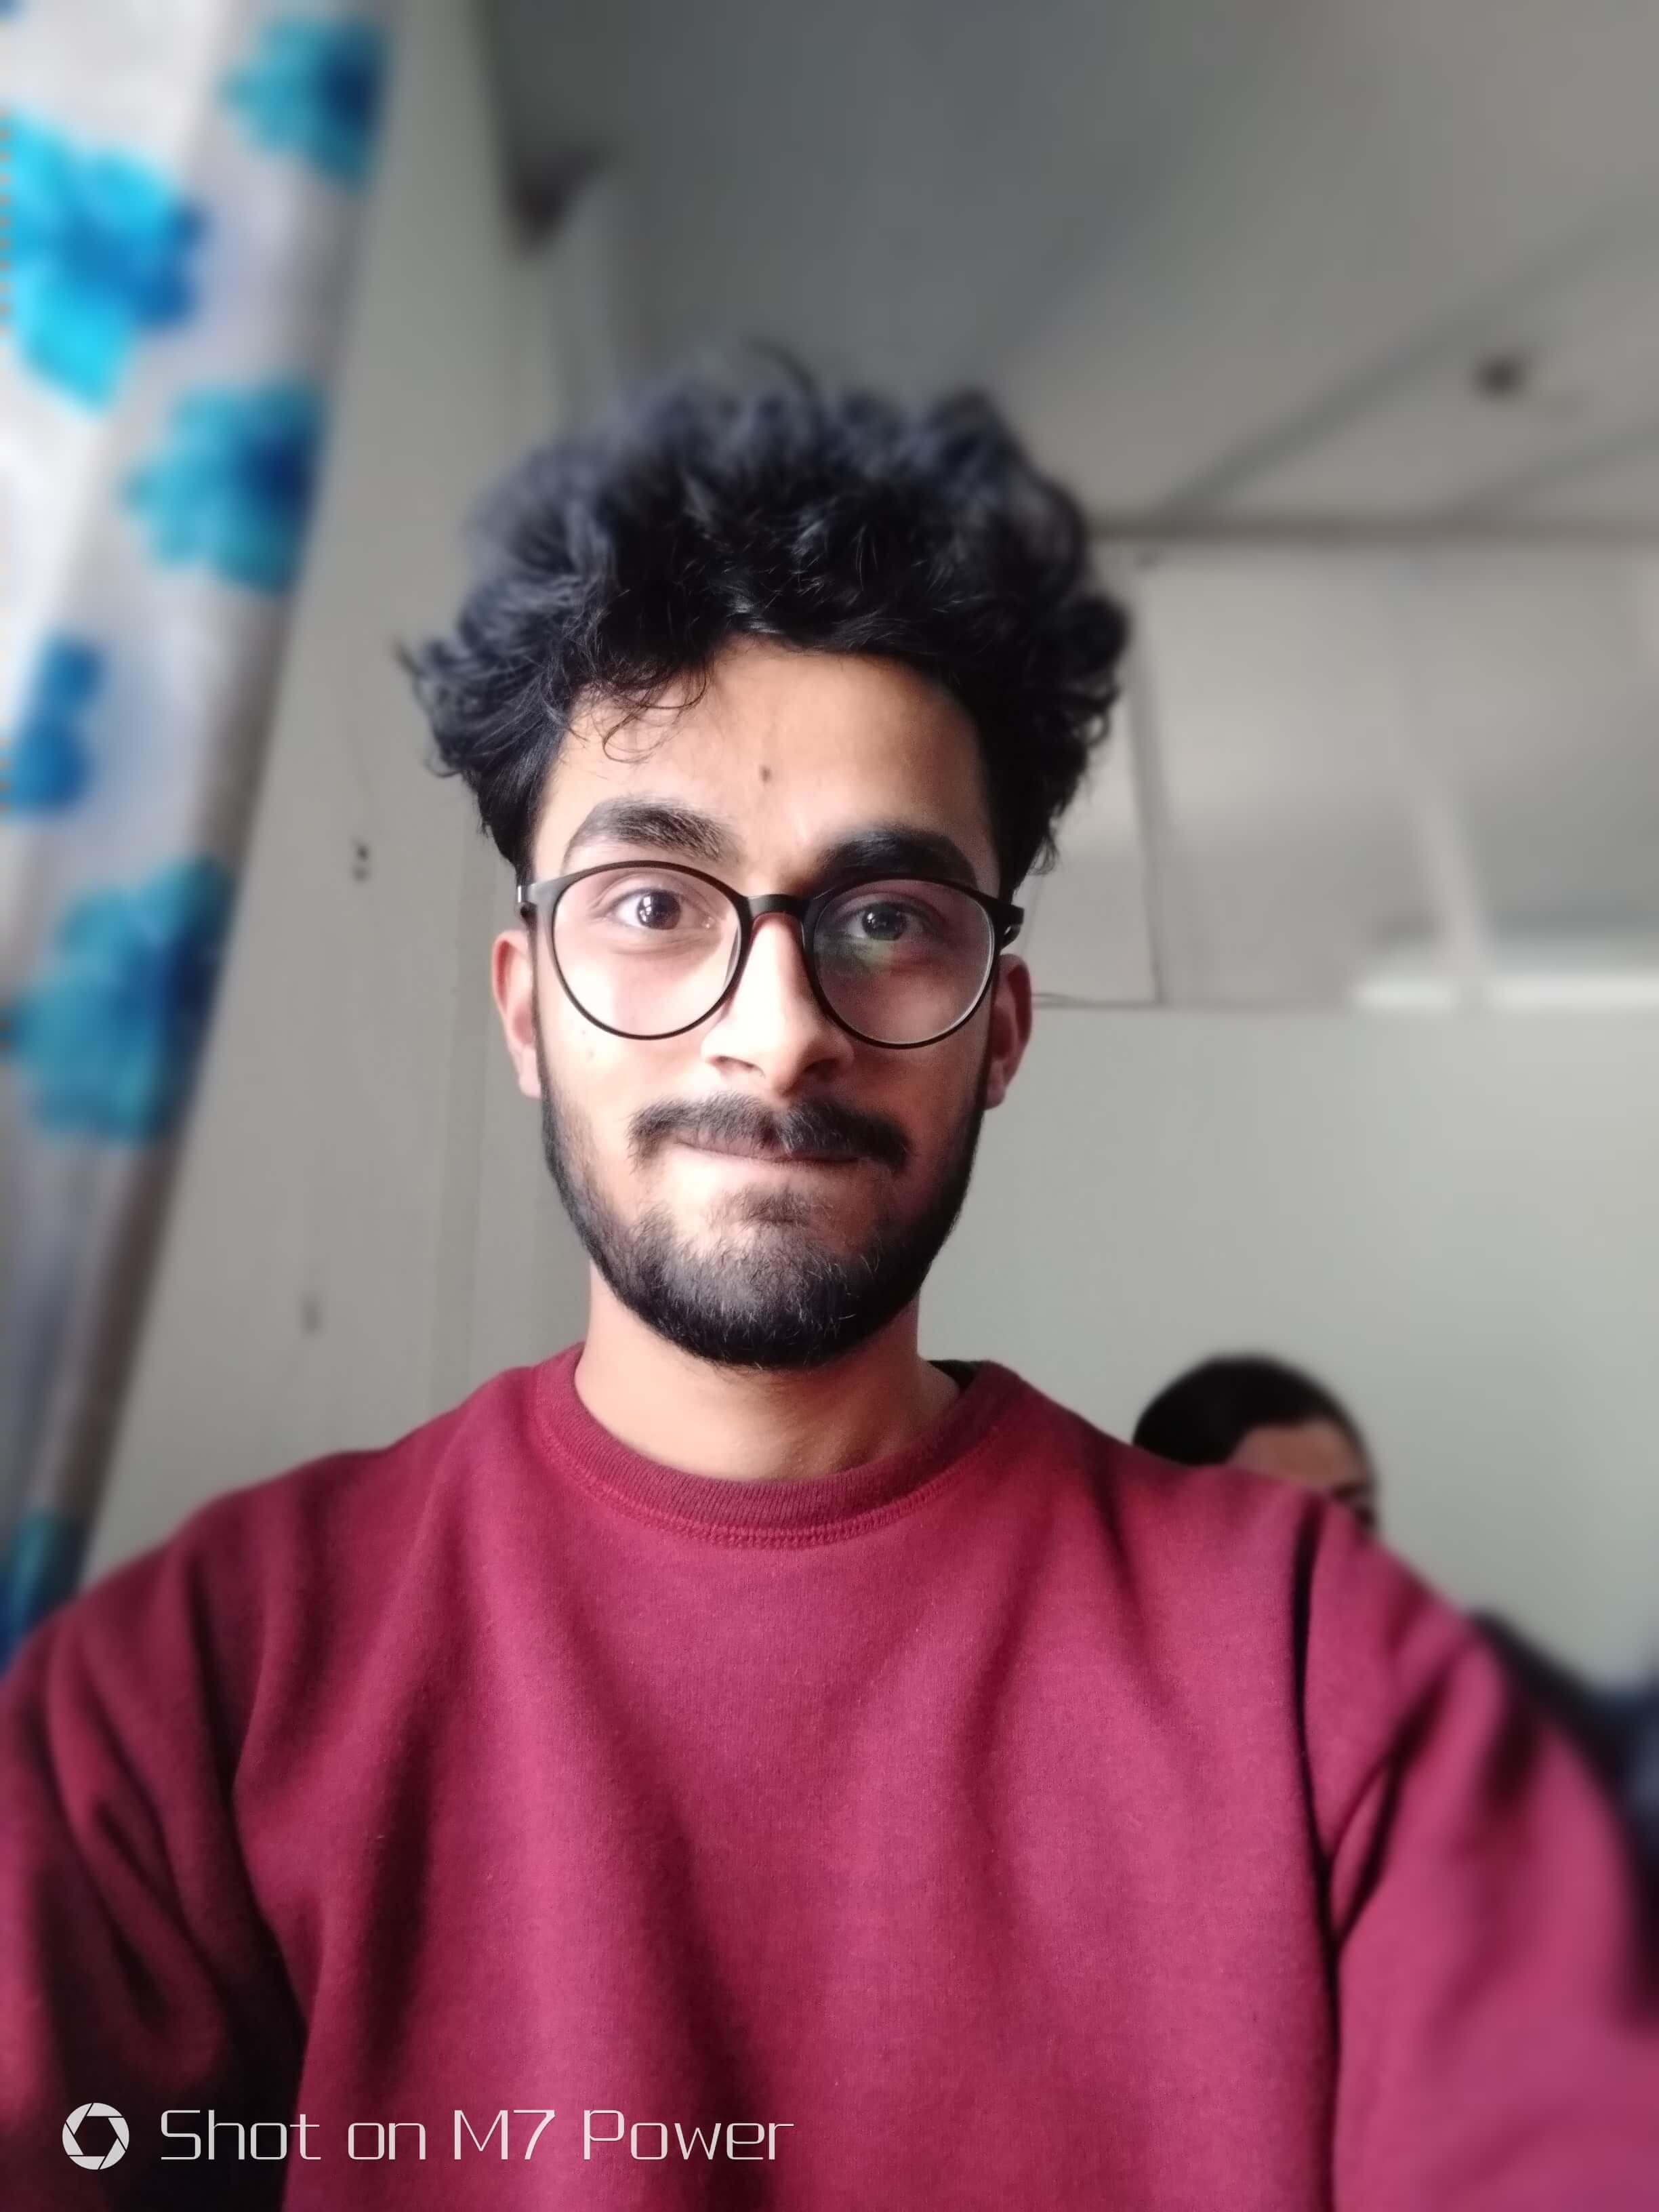 gionee m7 power review portrait selfie sample